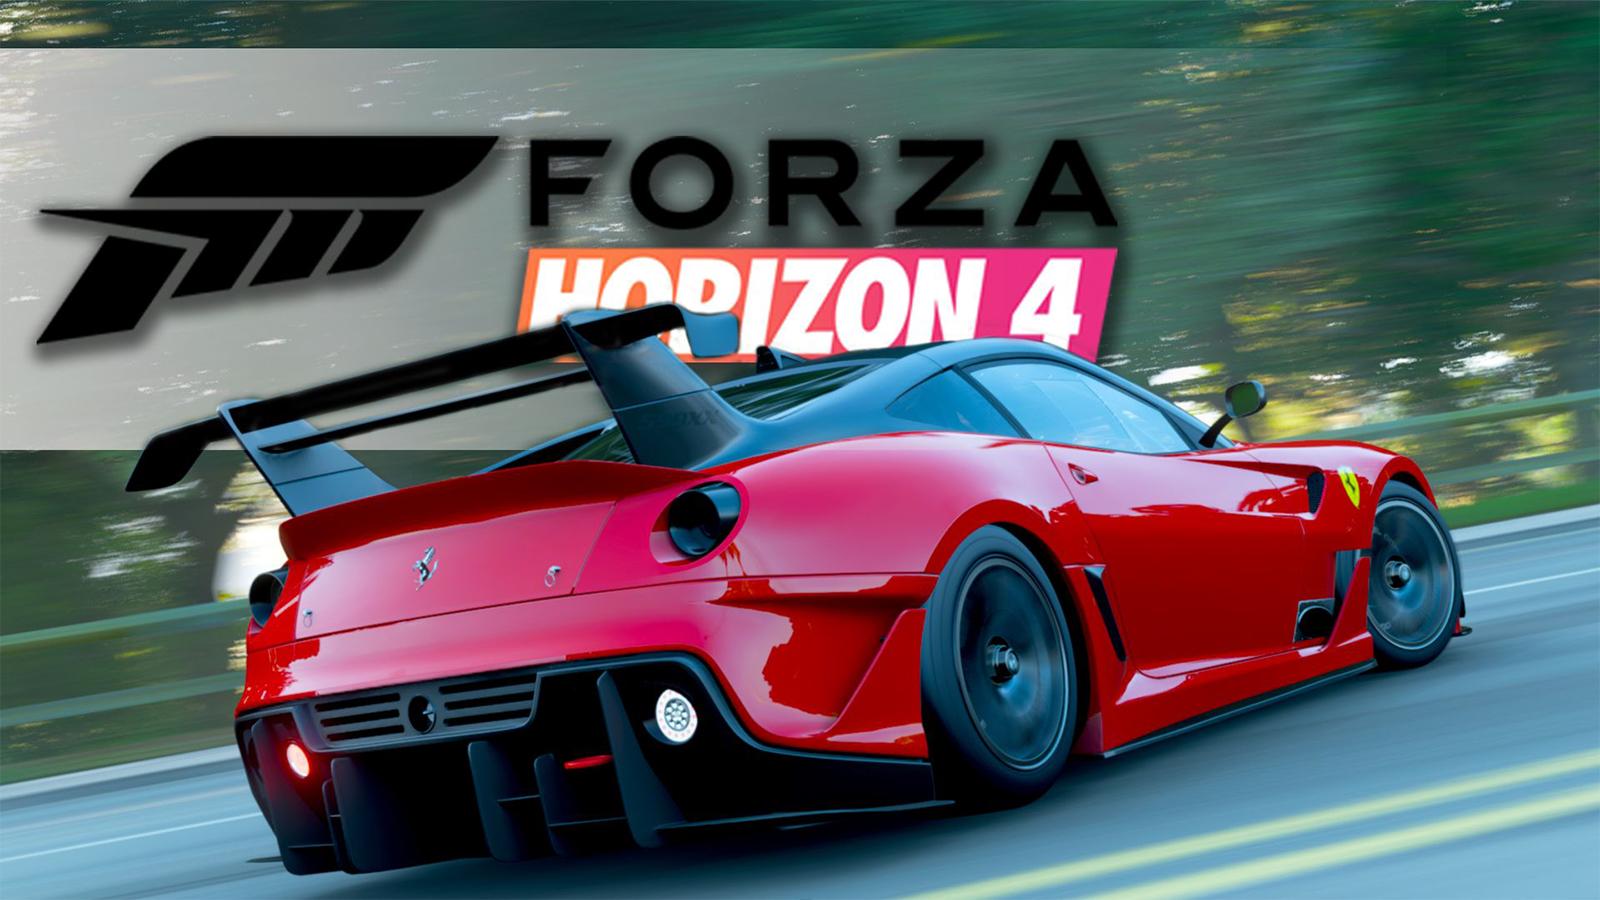 Forza Horizon 4 Stunt Jump Plane